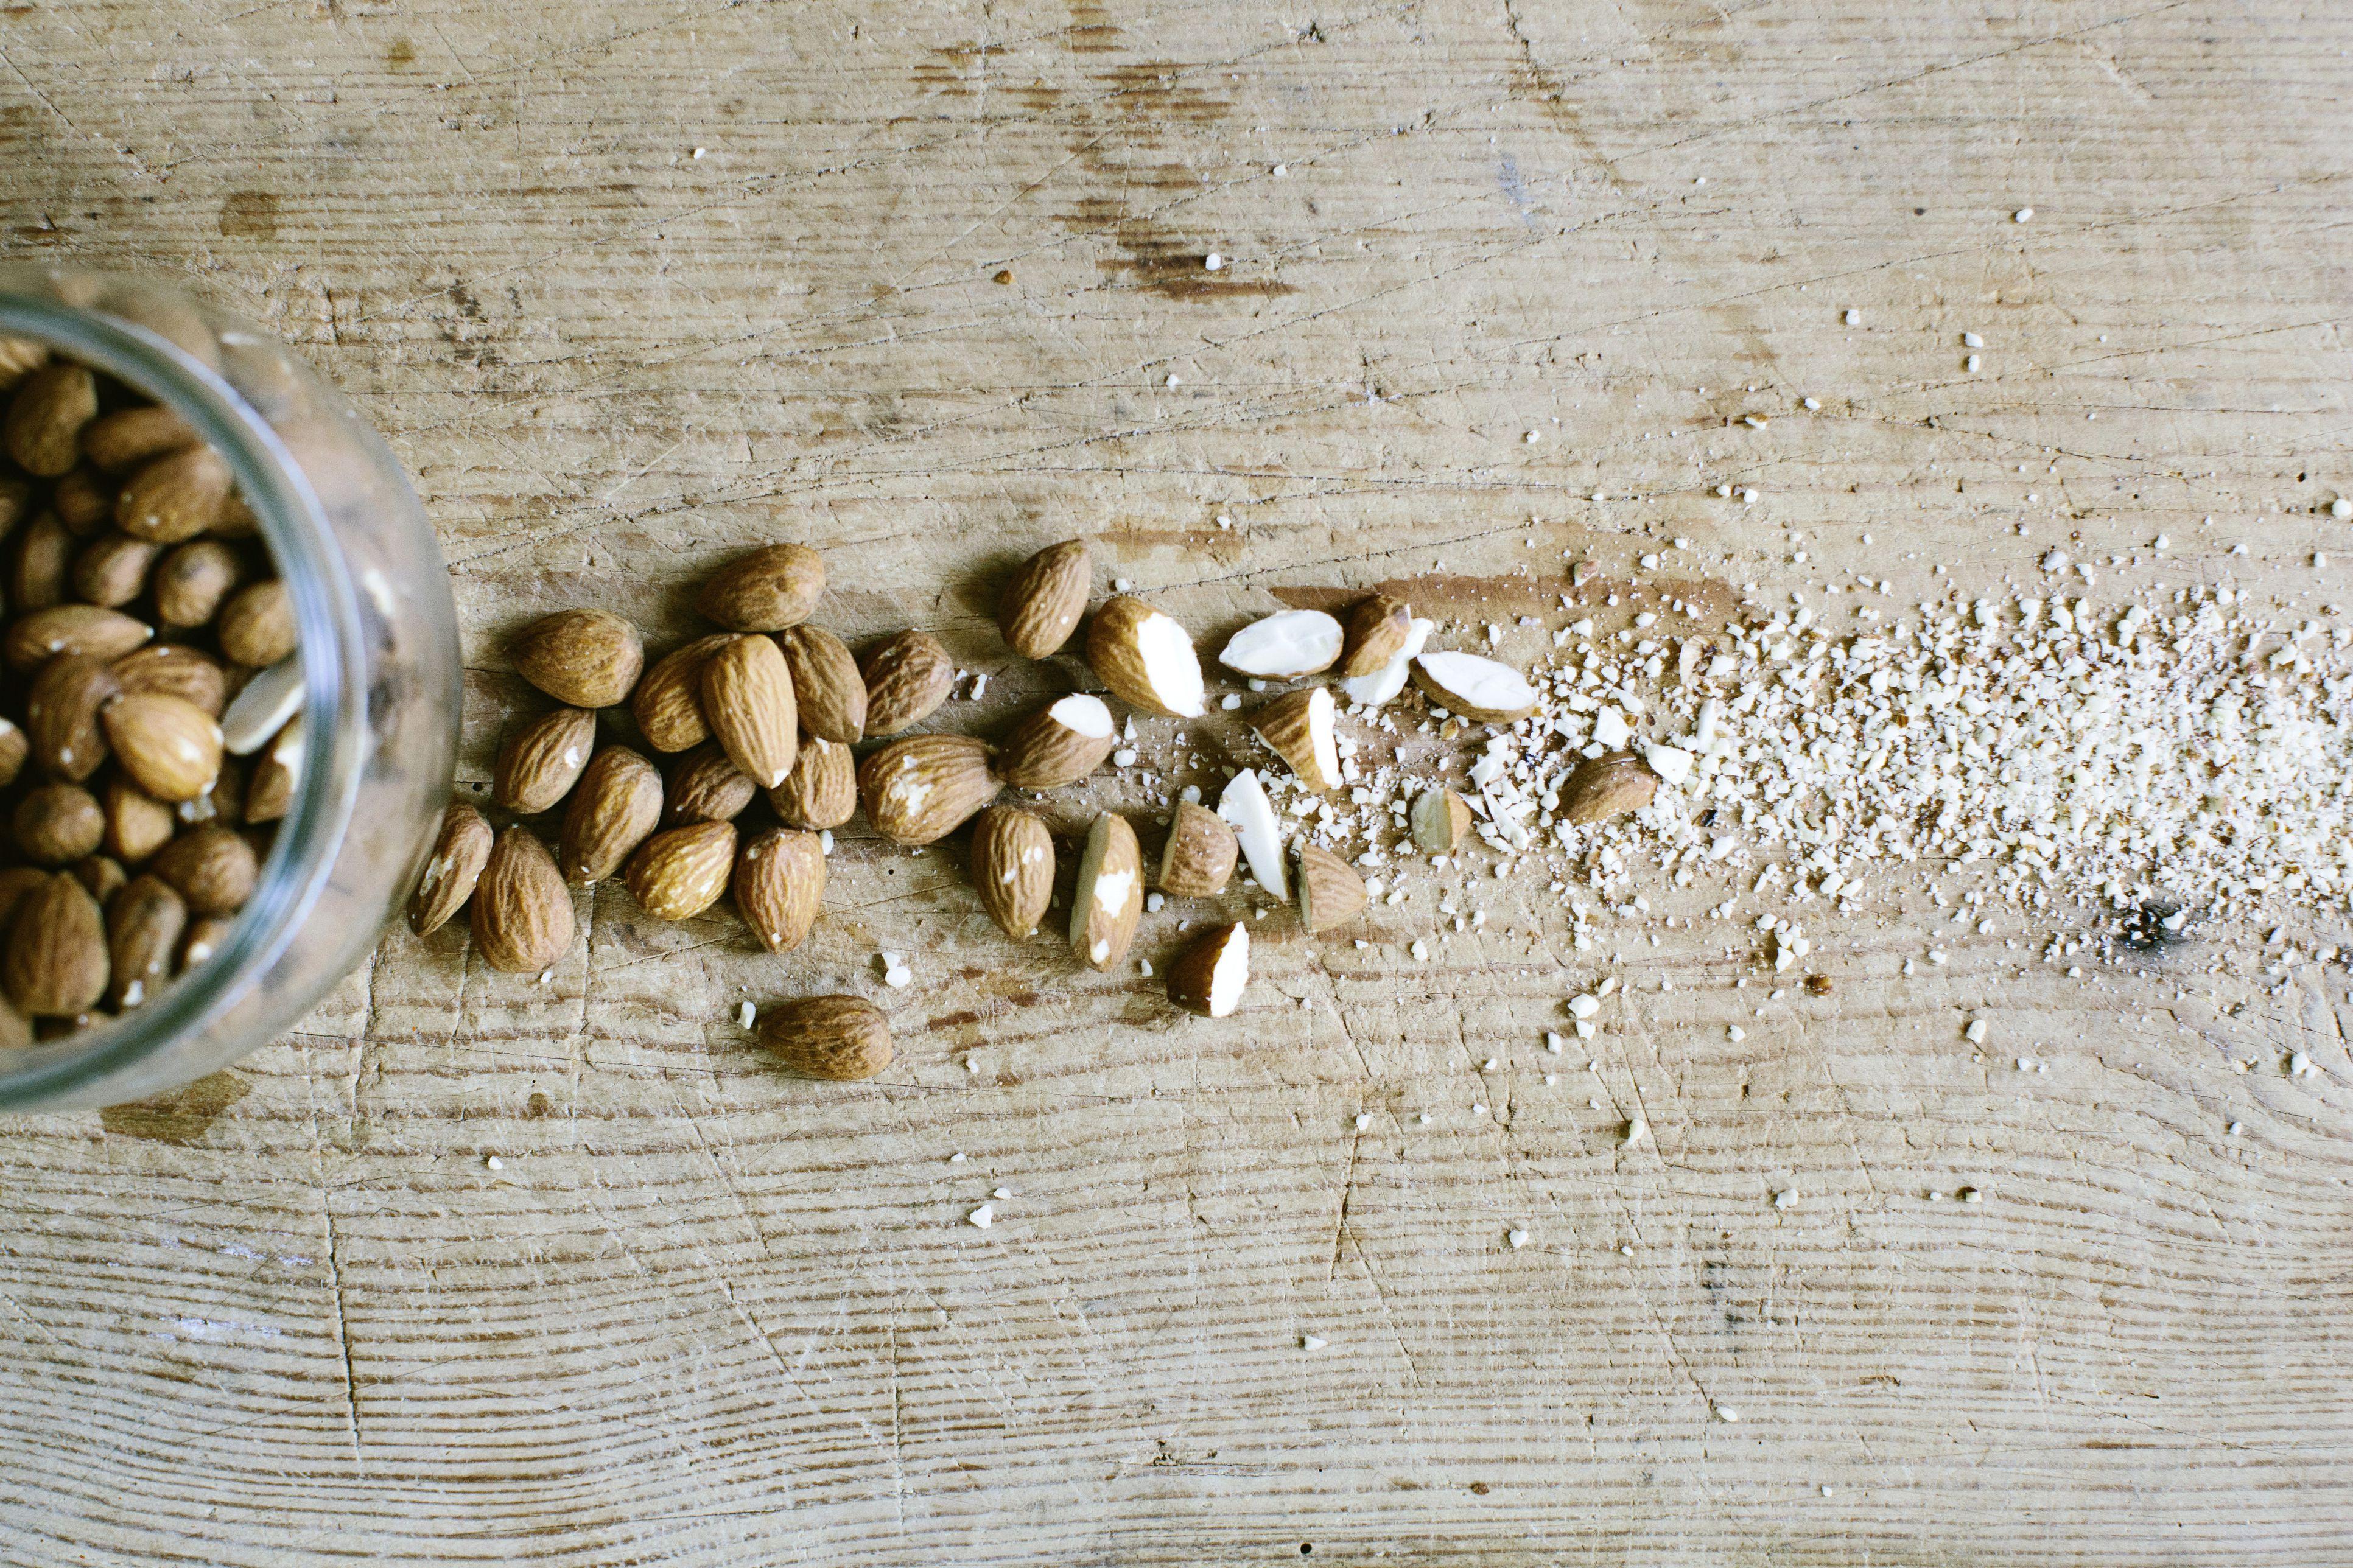 Germany, Berlin, Chopped almonds, close-up